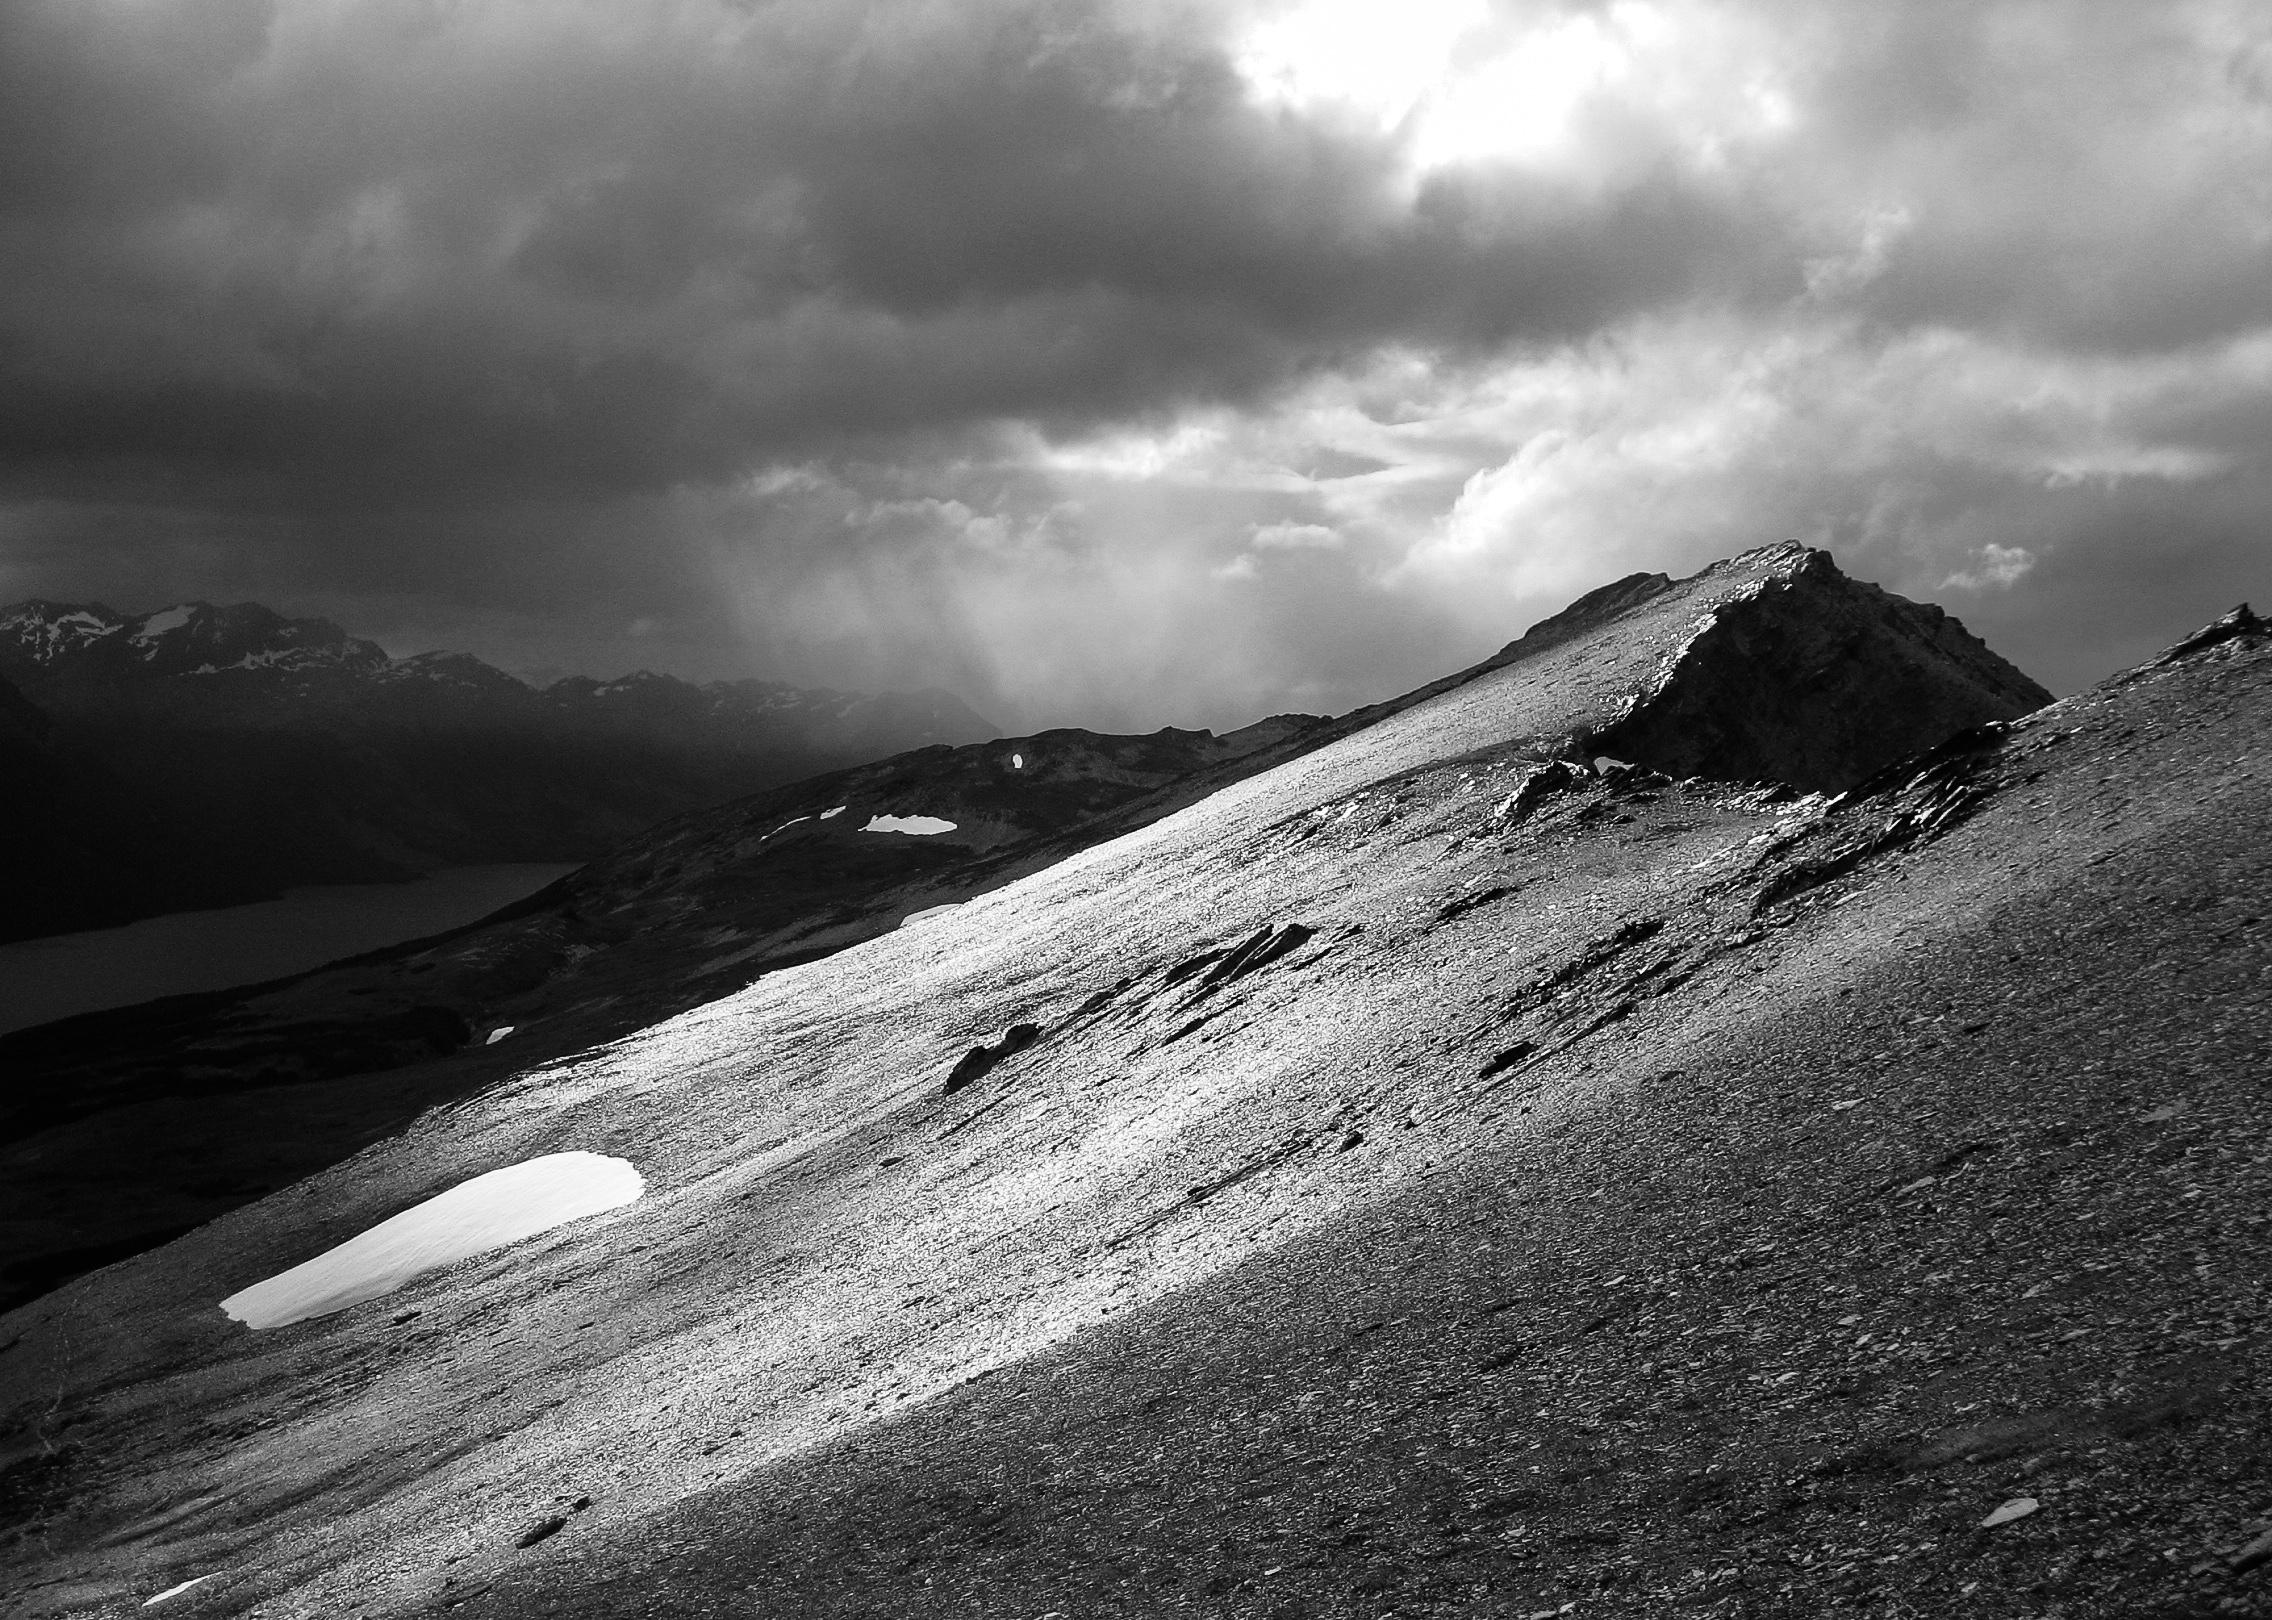 tierra-del-fuego_ushuaia_parque-nacional_day1-5090-_flat-gleaming-slope-from-ridge.jpg